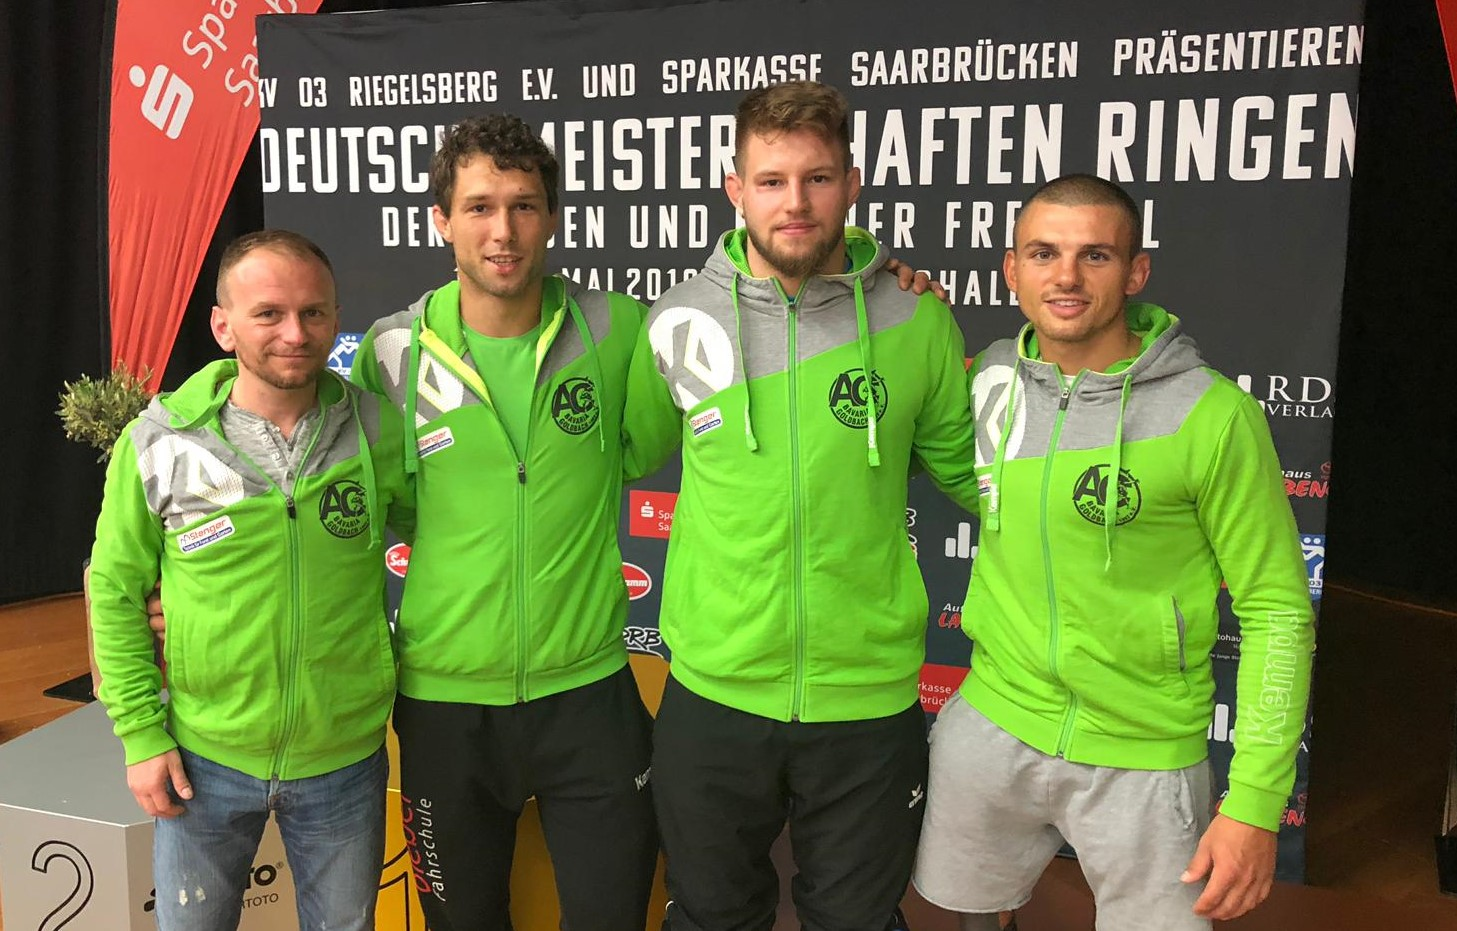 v.l. sportlicher Leiter: Markus Fisch, Michael Heeg, Johannes Deml, Simon Hüttner